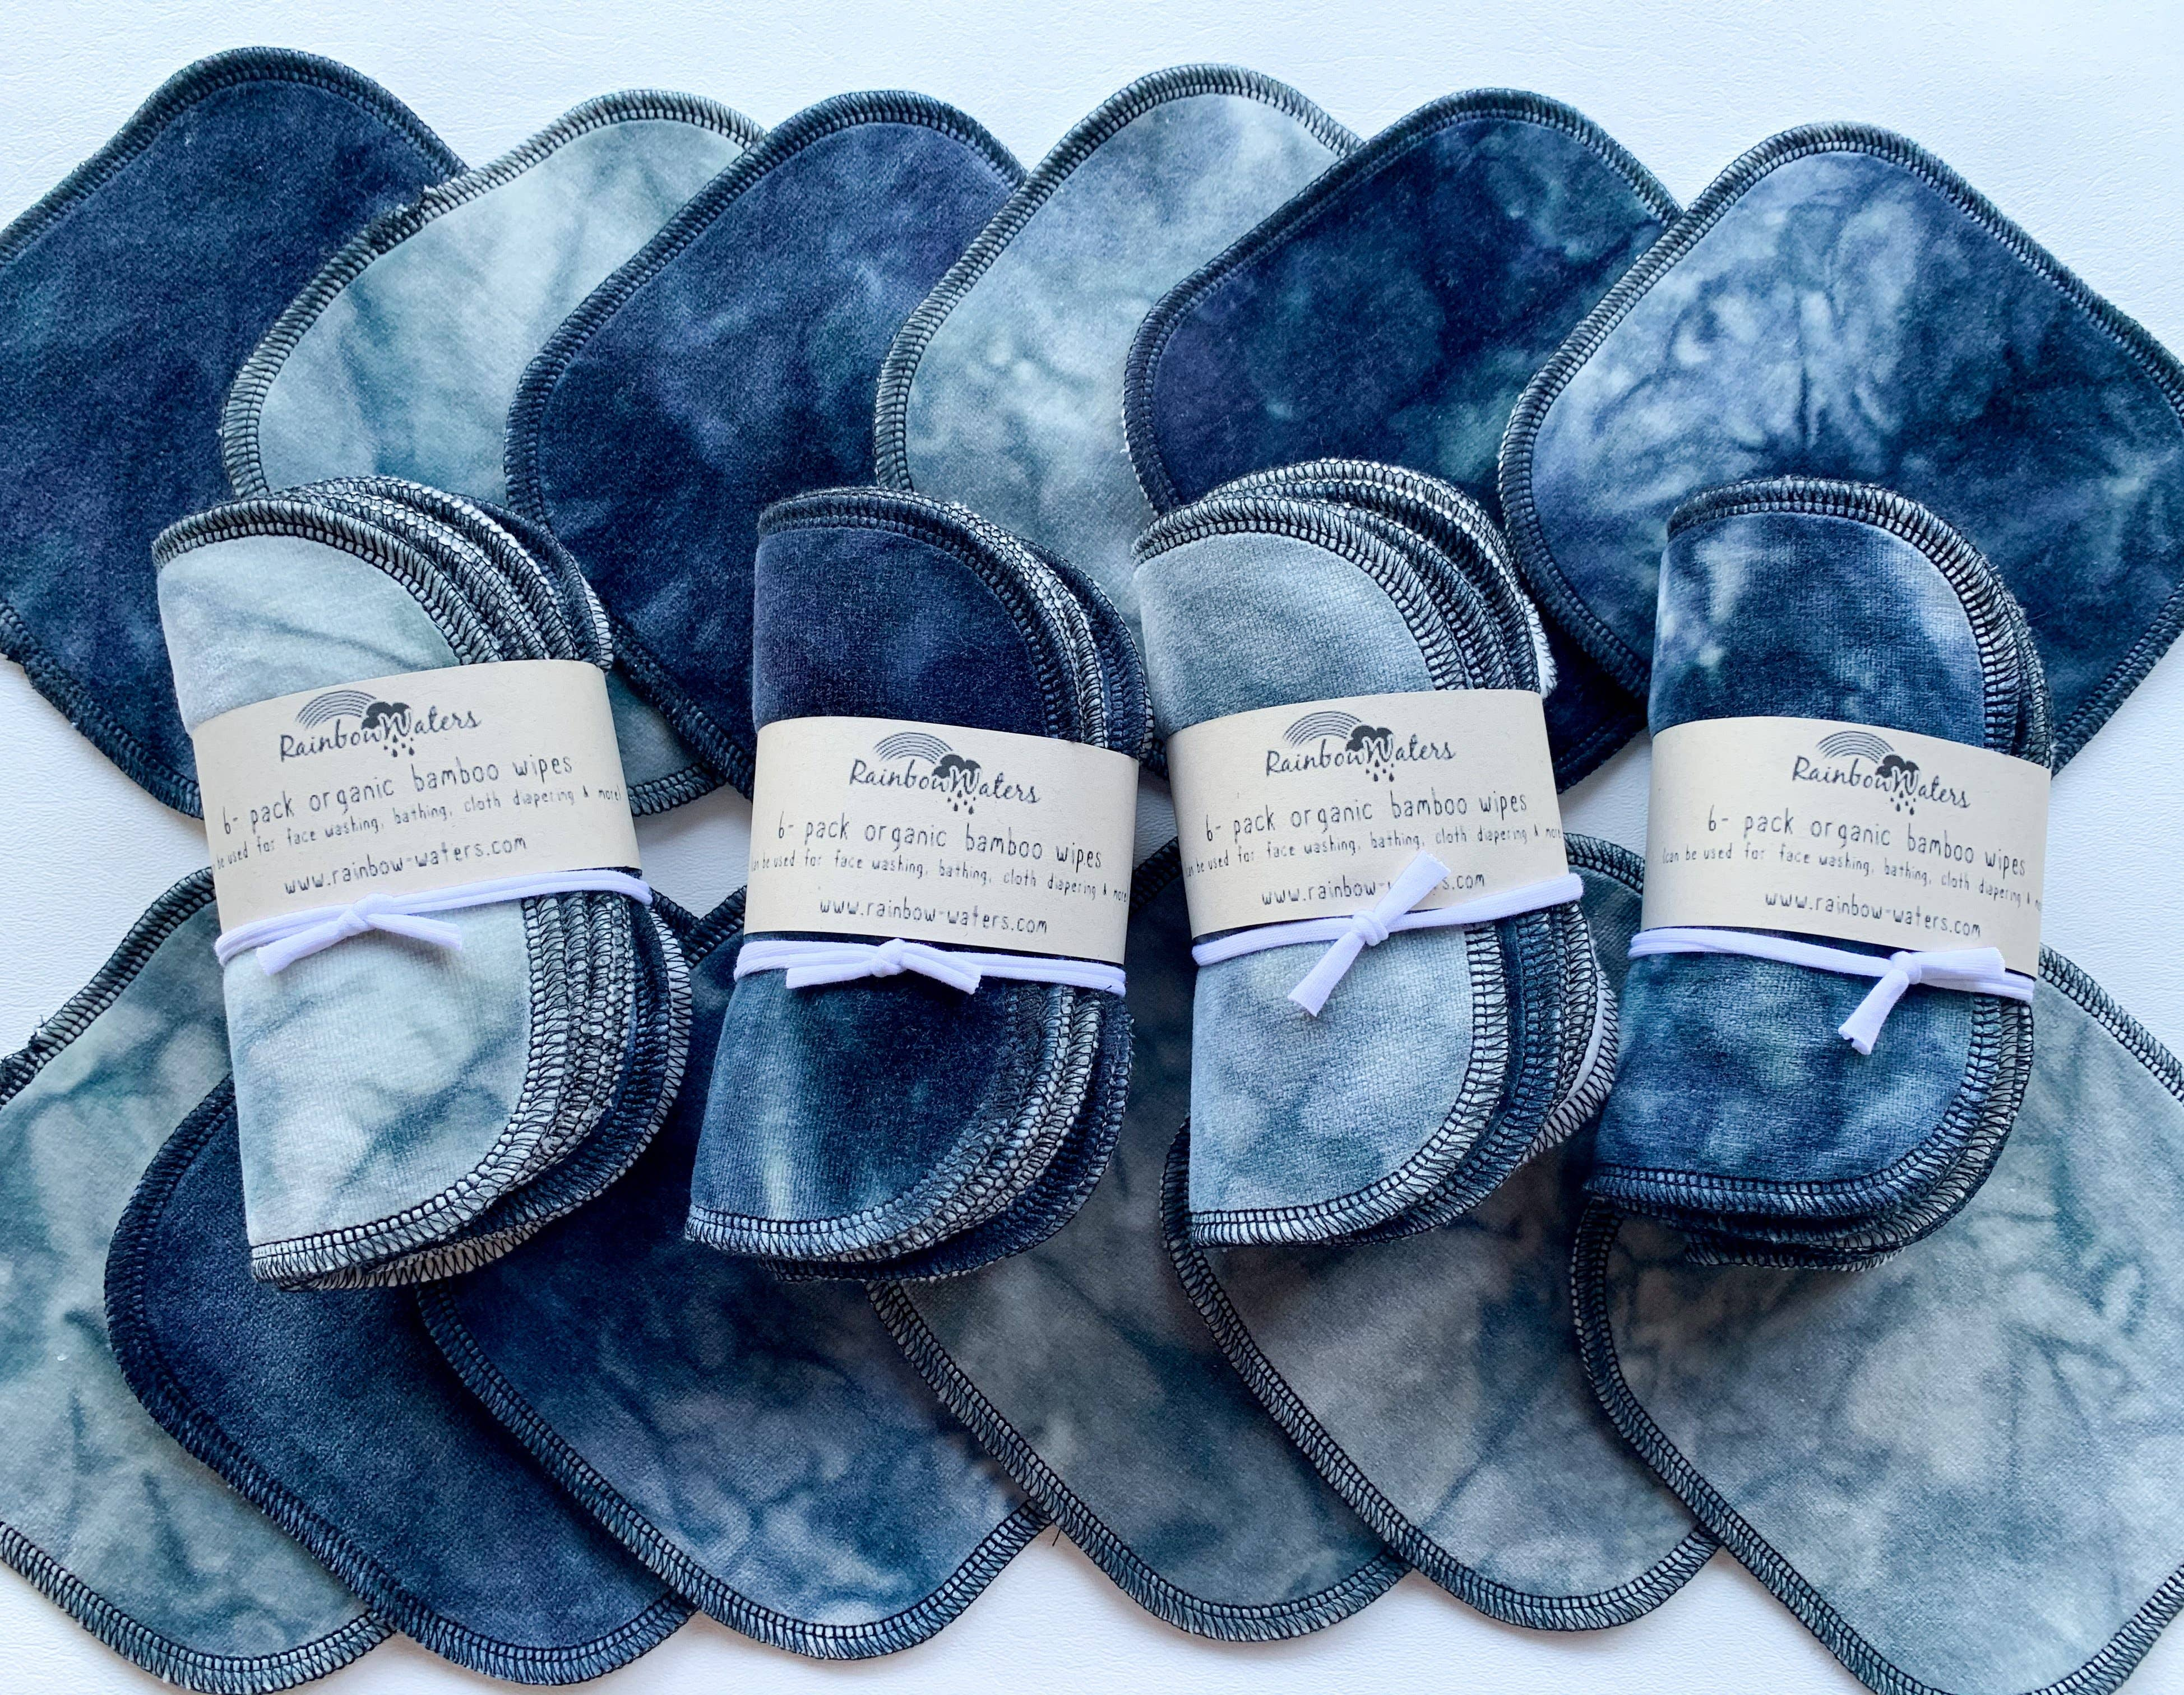 Handmade Organic Cotton Fleece Sweatshorts Organic Tea Tie Dyed